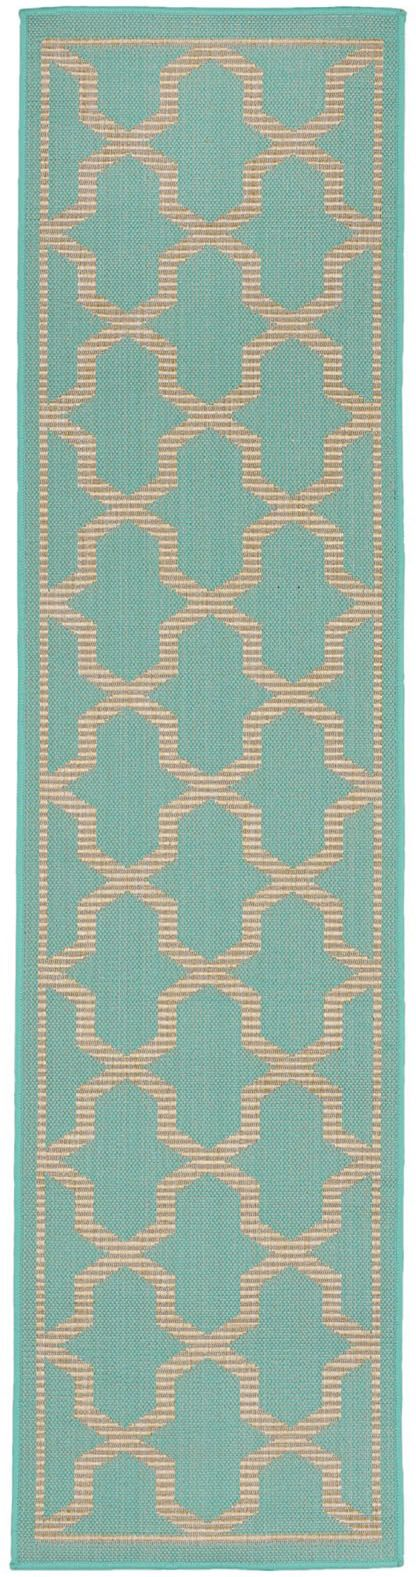 trans ocean tulum contemporary area rug collection